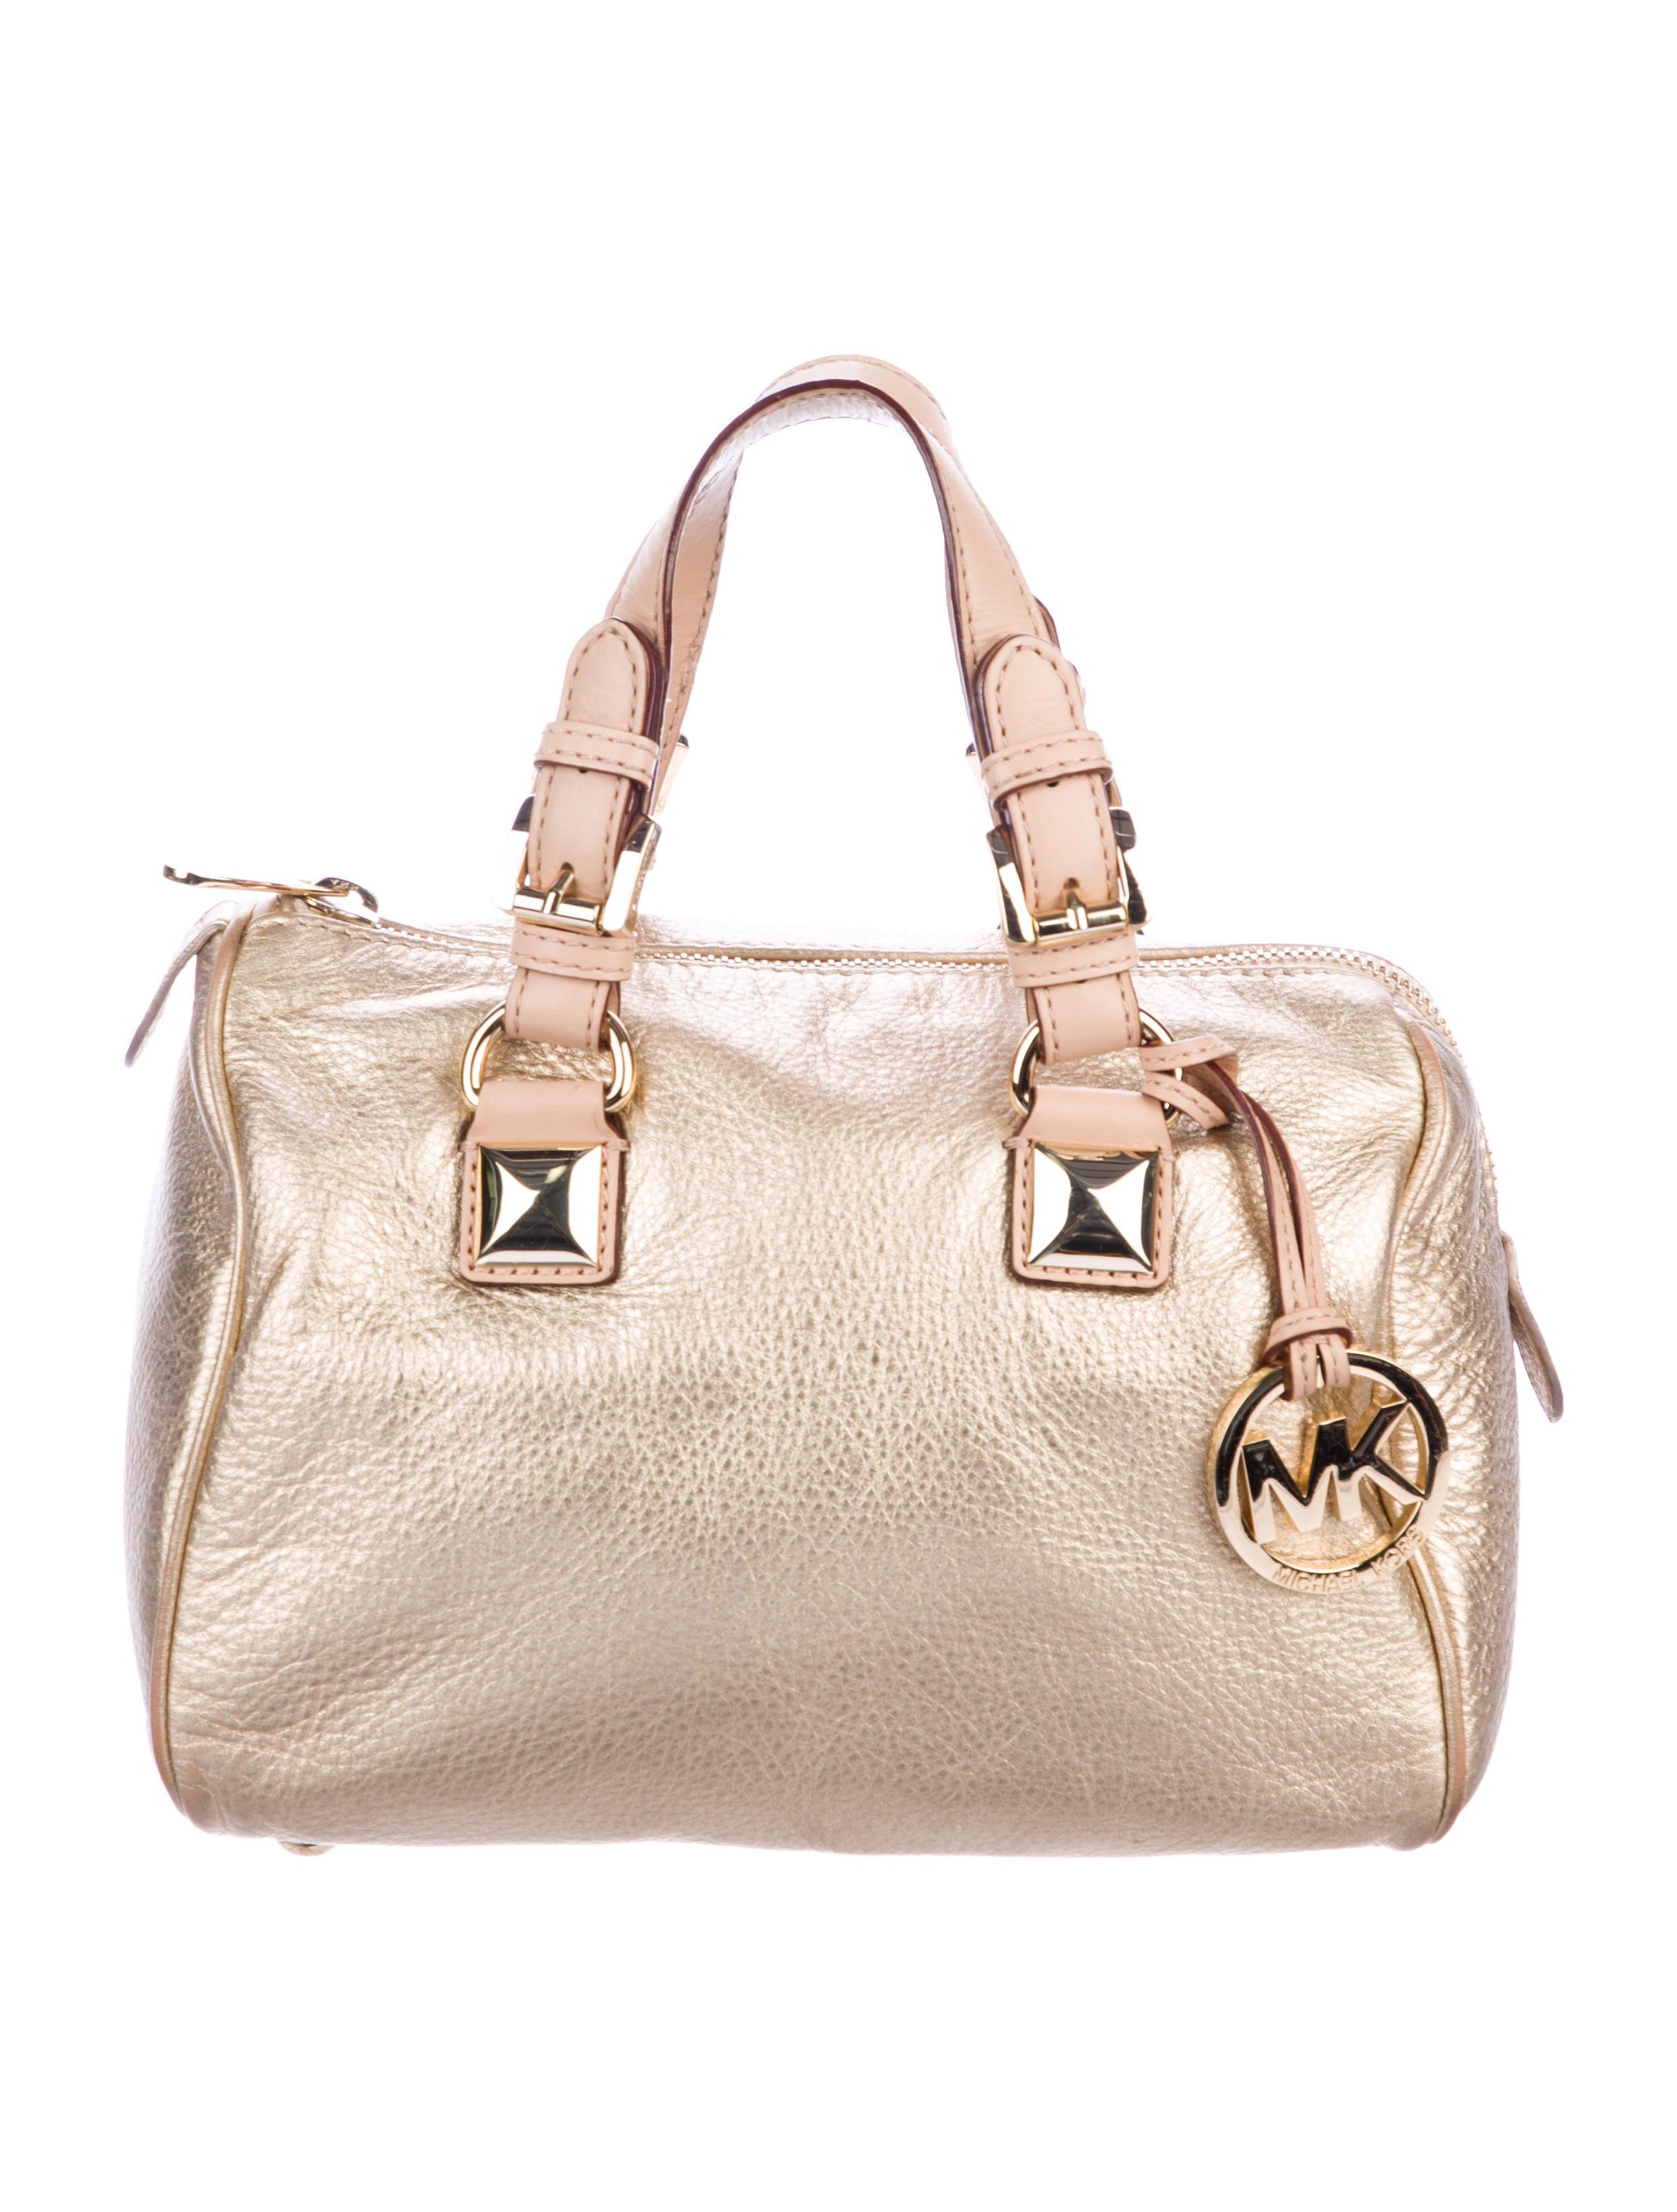 Michael Michael Kors Metallic Leather Handle Bag Handbags